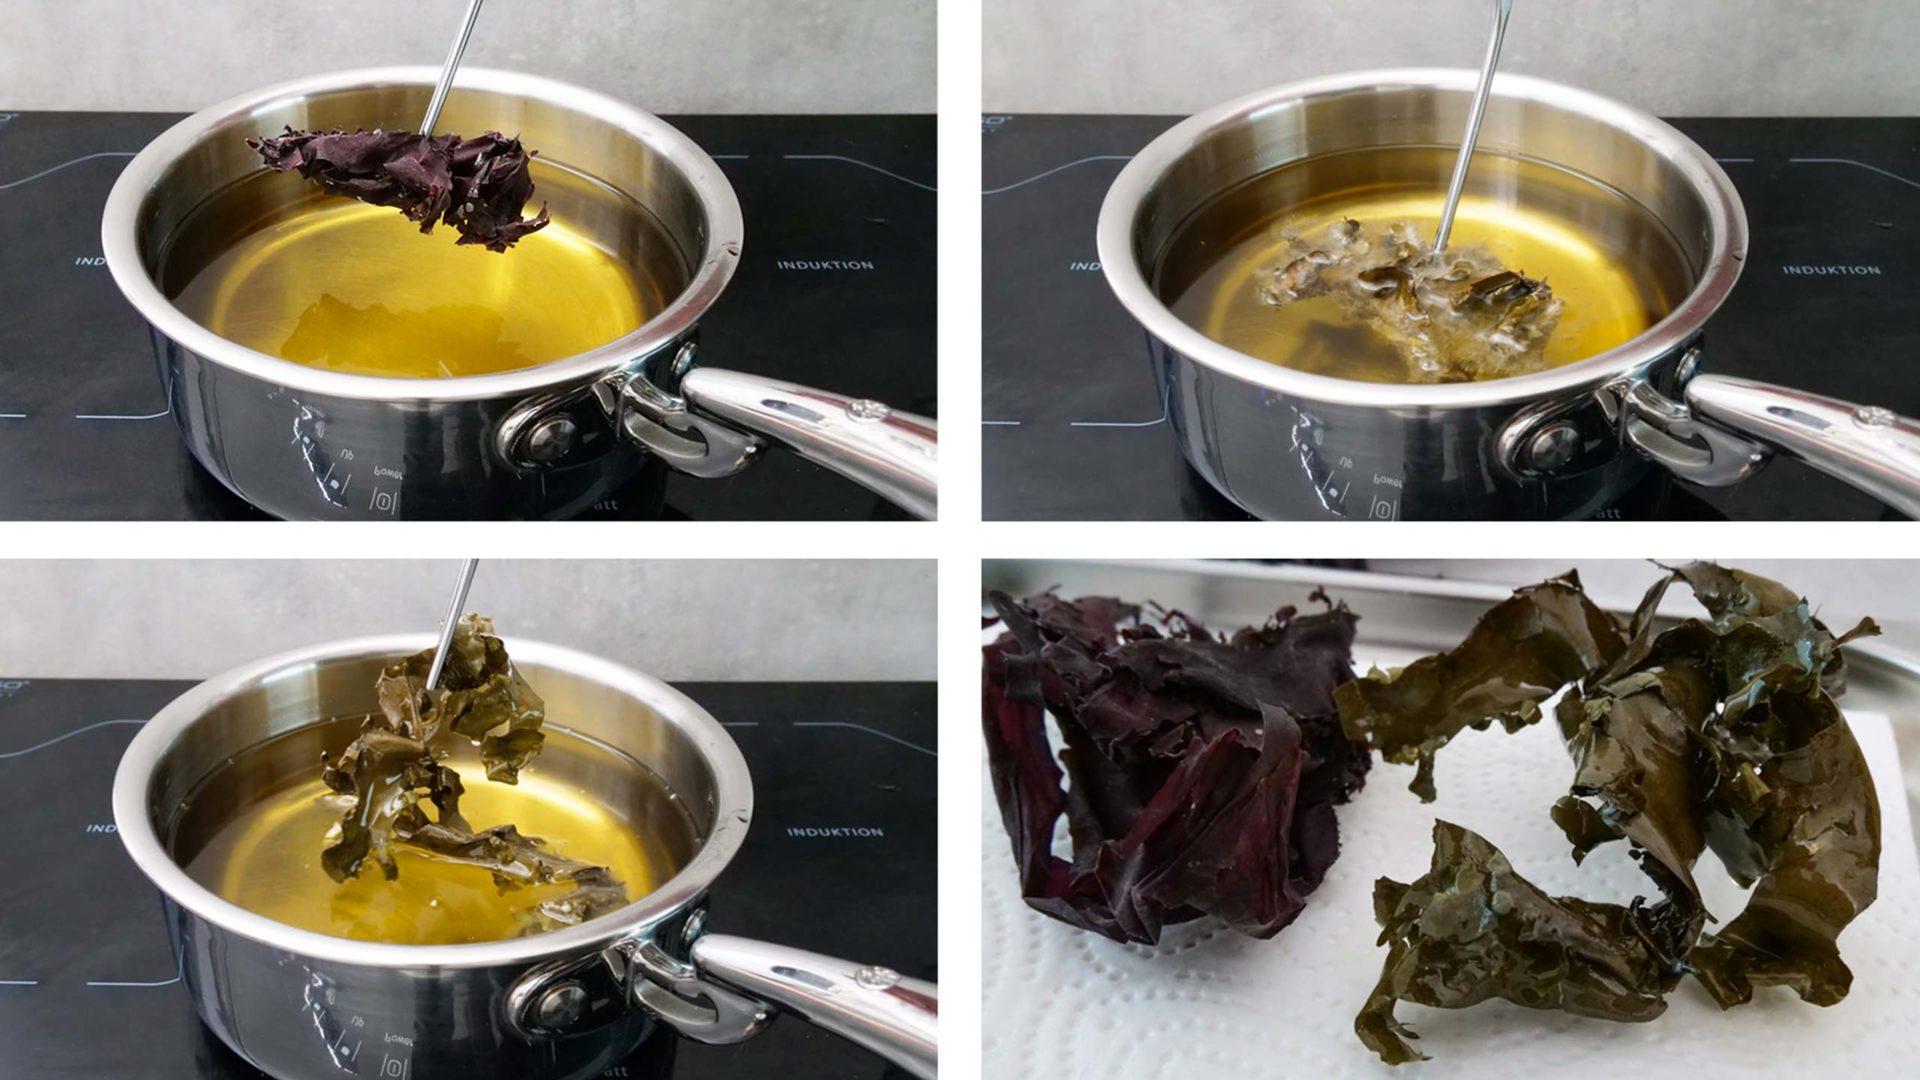 Ein Getrocknetes Dulseblatt wird frittiert